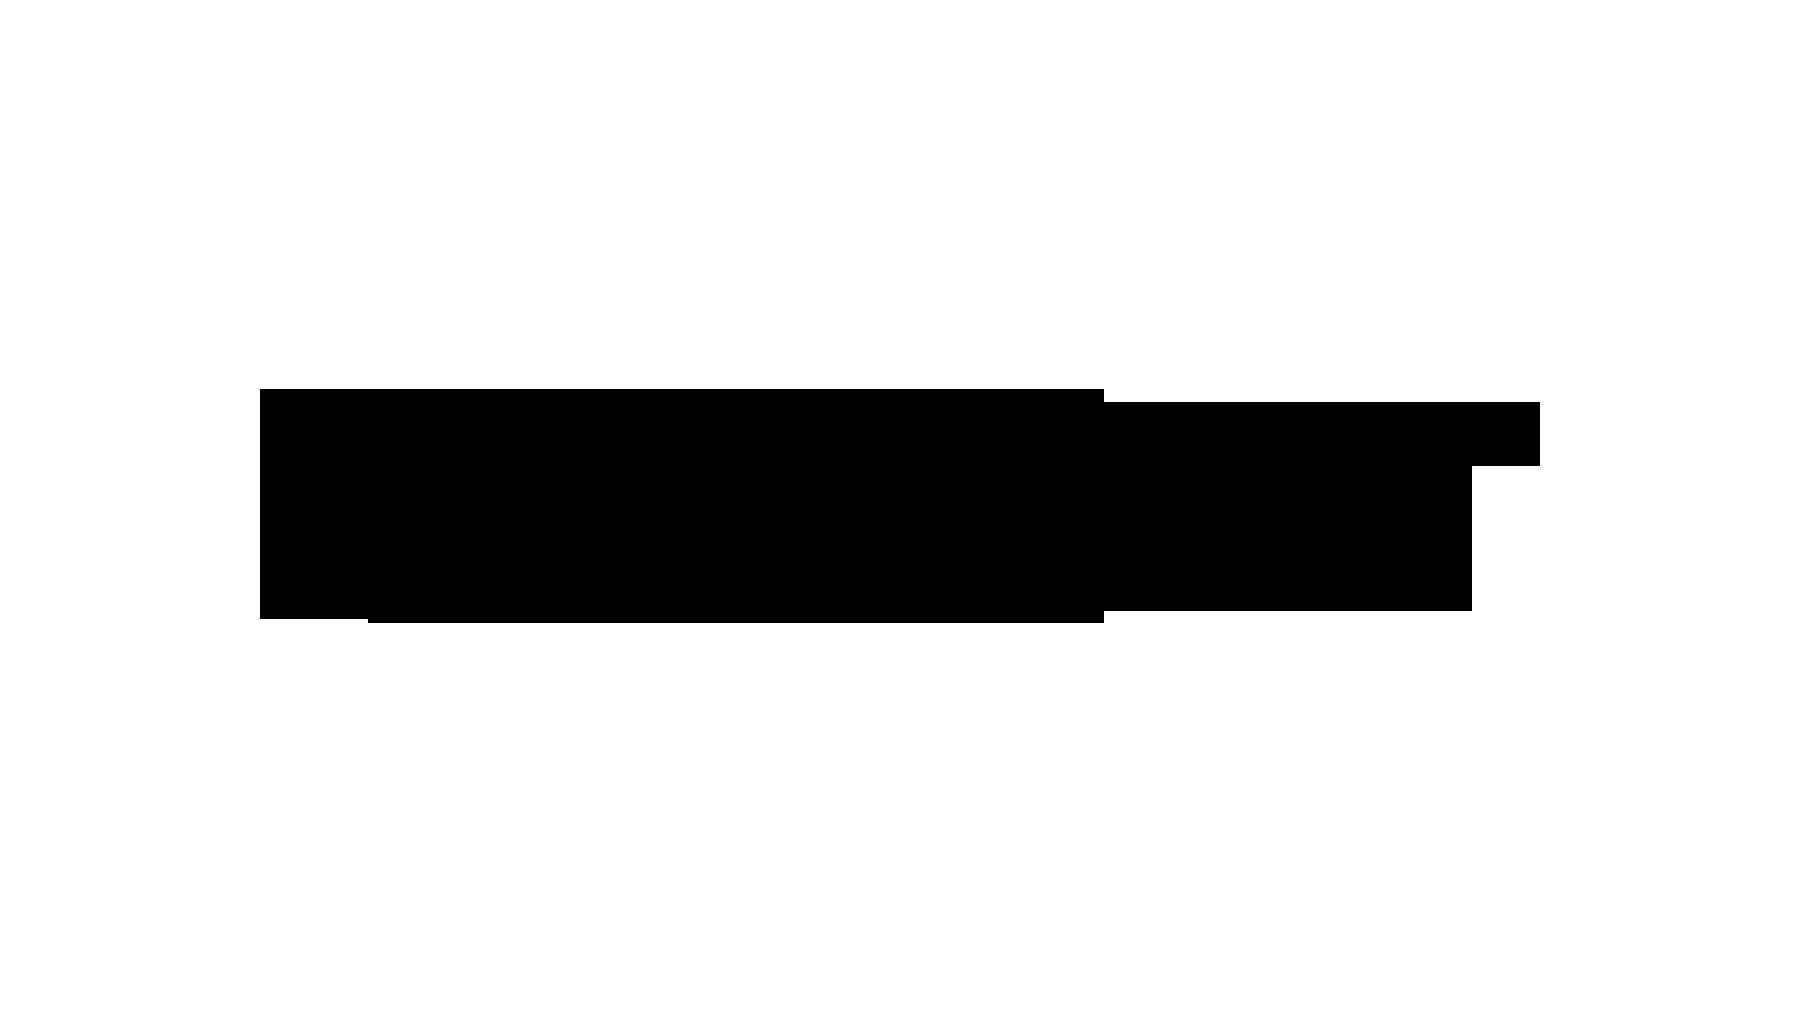 Sony Vaio PCG-71211M